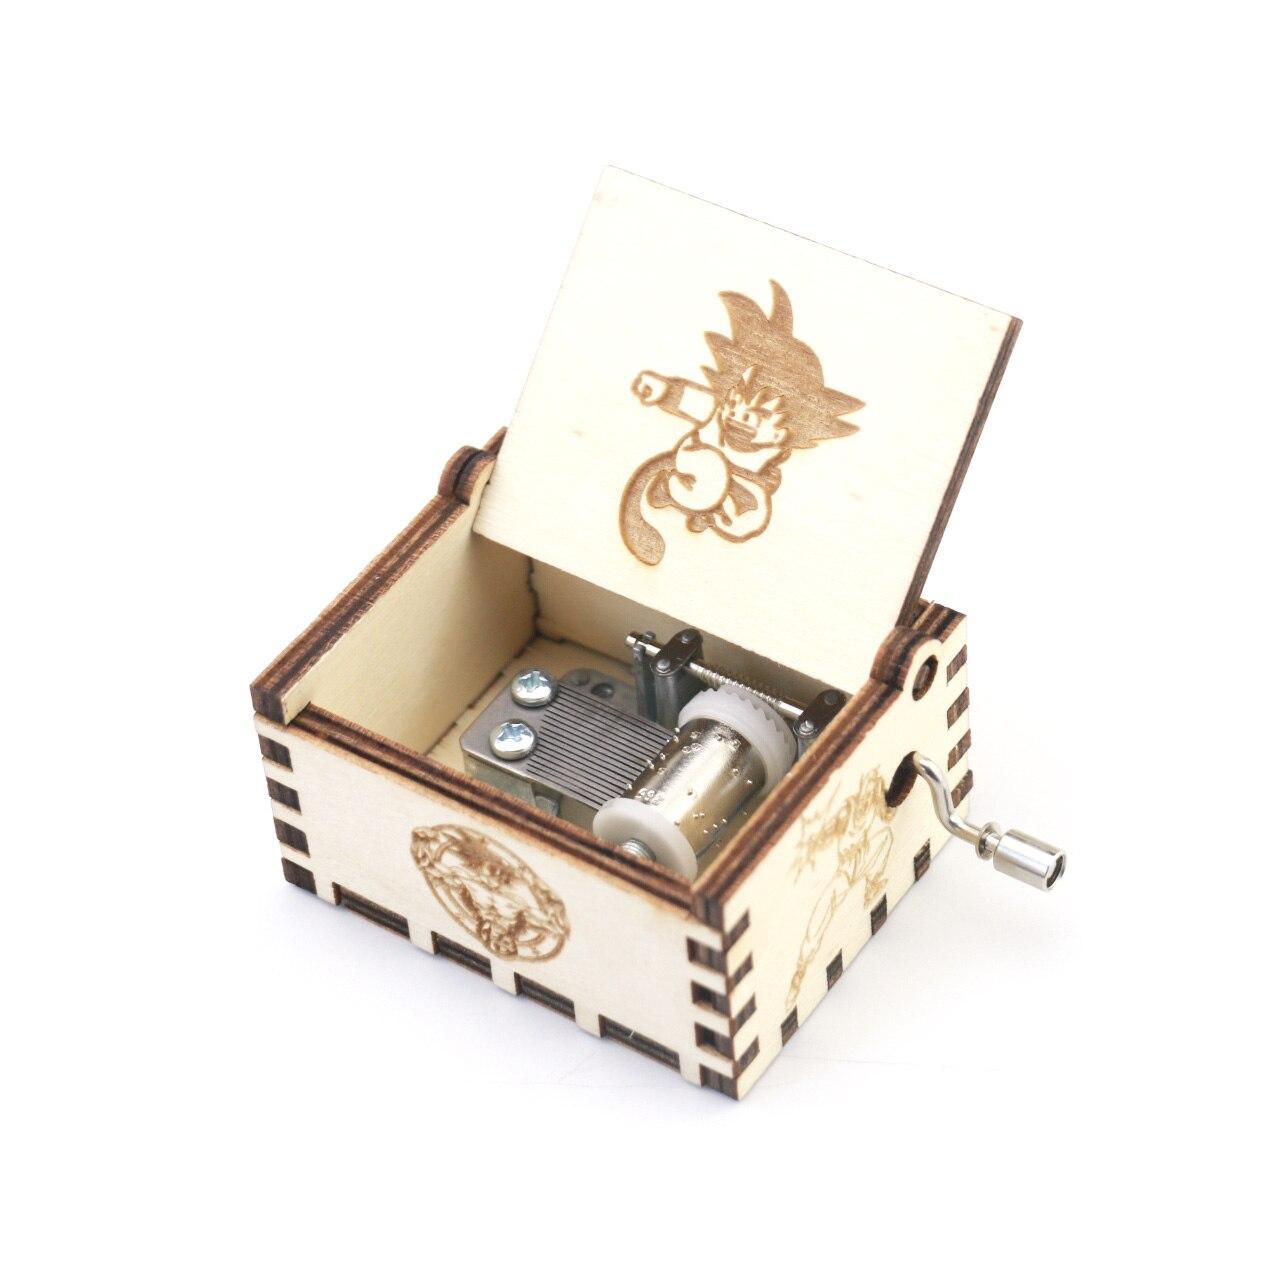 Dragon ball caixa de música mão manivela esculpida caixa musical de madeira, presente musical, jogar dragon ball z-tapion tema anime caixa de música